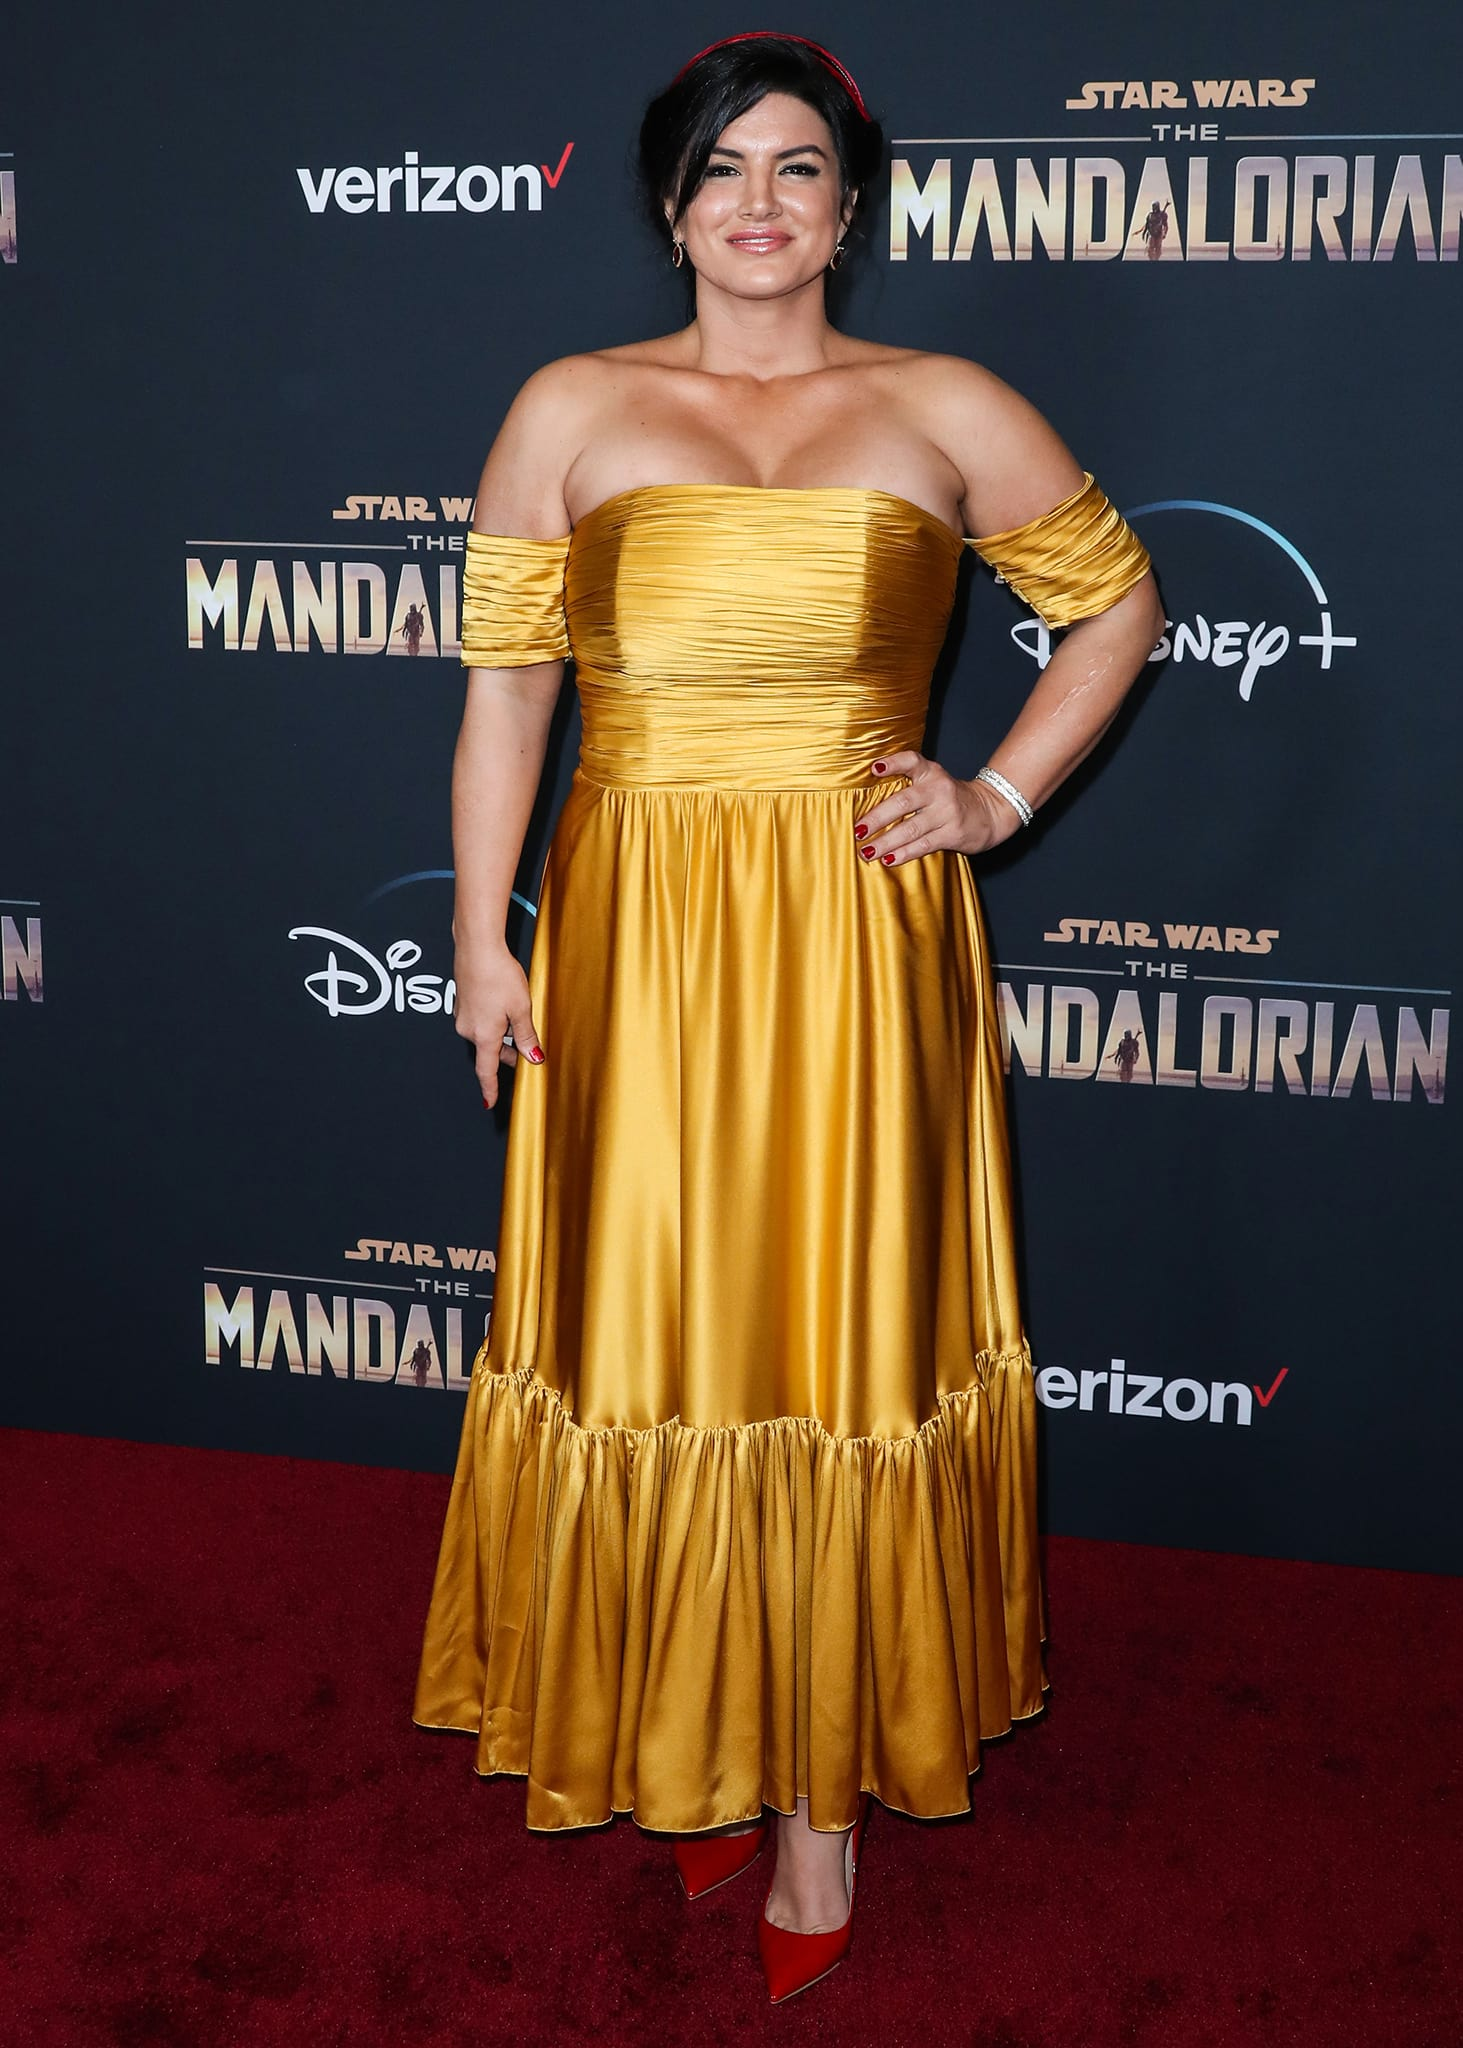 Gina Carano at the Los Angeles premiere of Disney+'s The Mandalorian held at the El Capitan Theatre on November 13, 2019